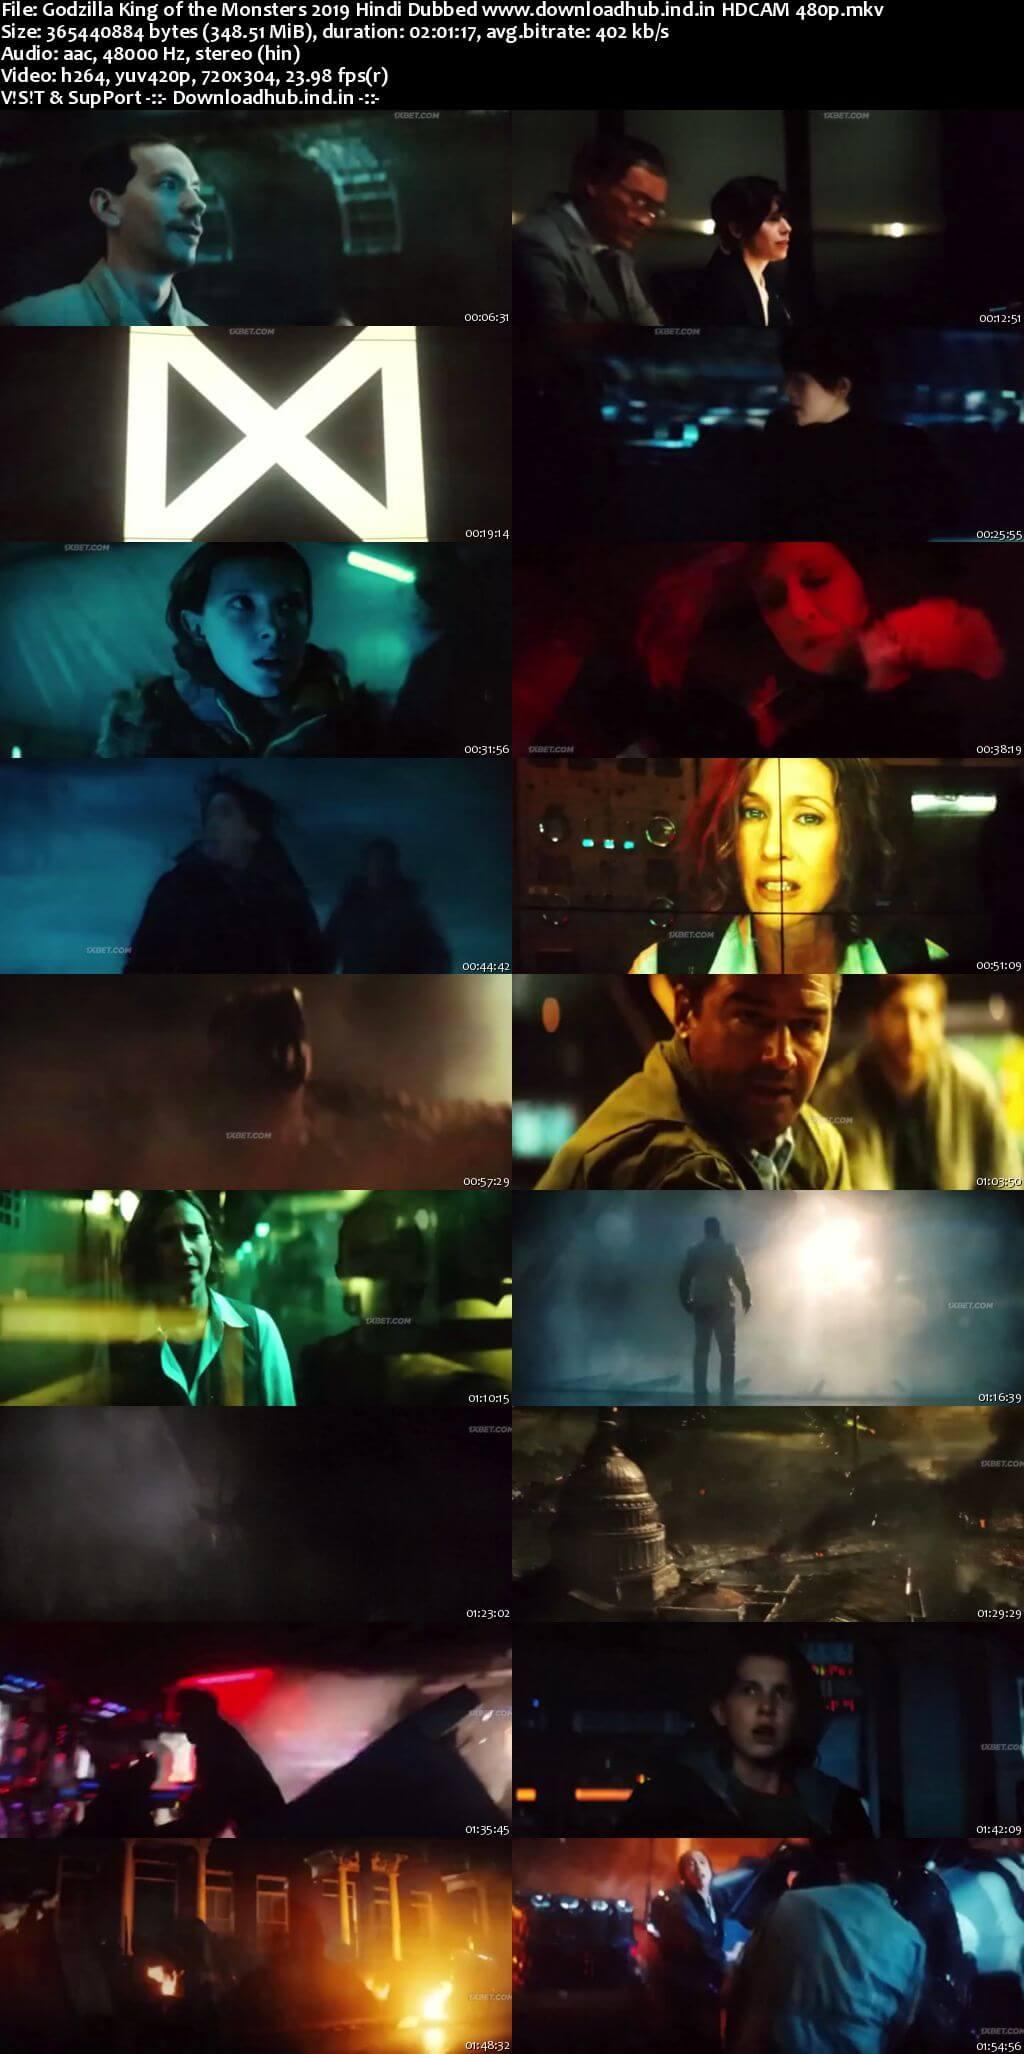 Godzilla King of the Monsters 2019 Hindi Dubbed 350MB HDCAM 480p